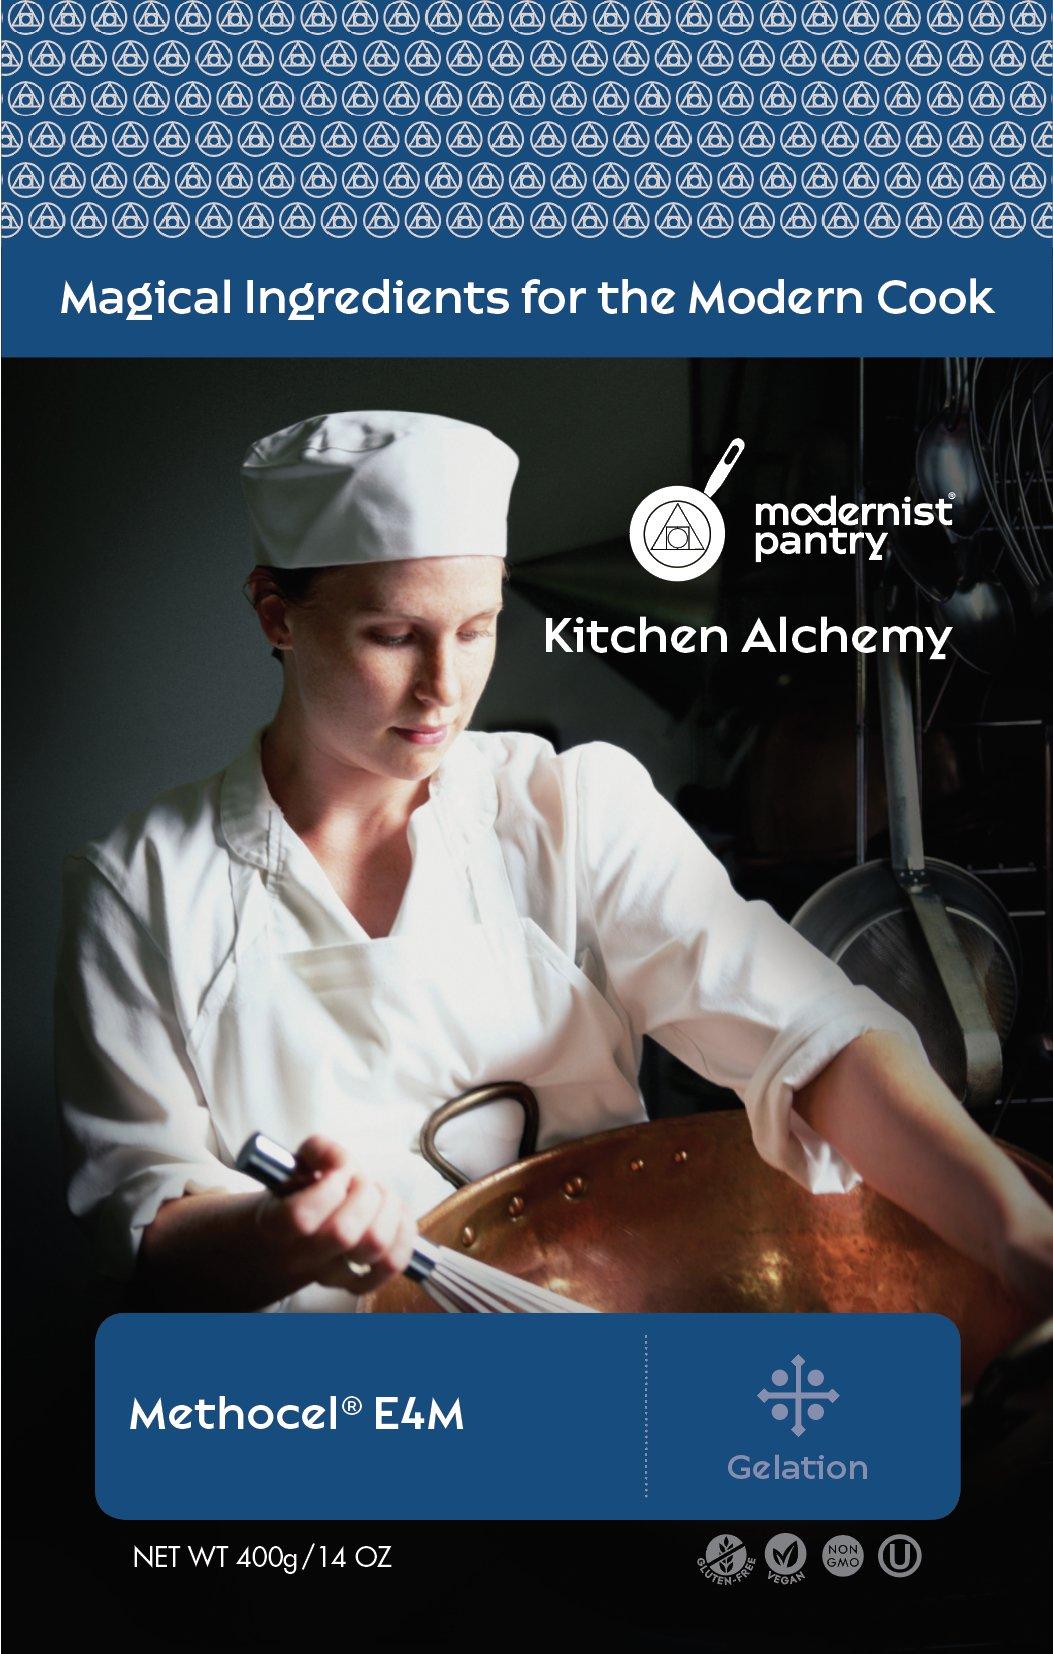 Methylcellulose - Methocel E4M (Molecular Gastronomy) ⊘ Non-GMO ☮ Vegan ✡ OU Kosher Certified - 400g/14oz by Modernist Pantry